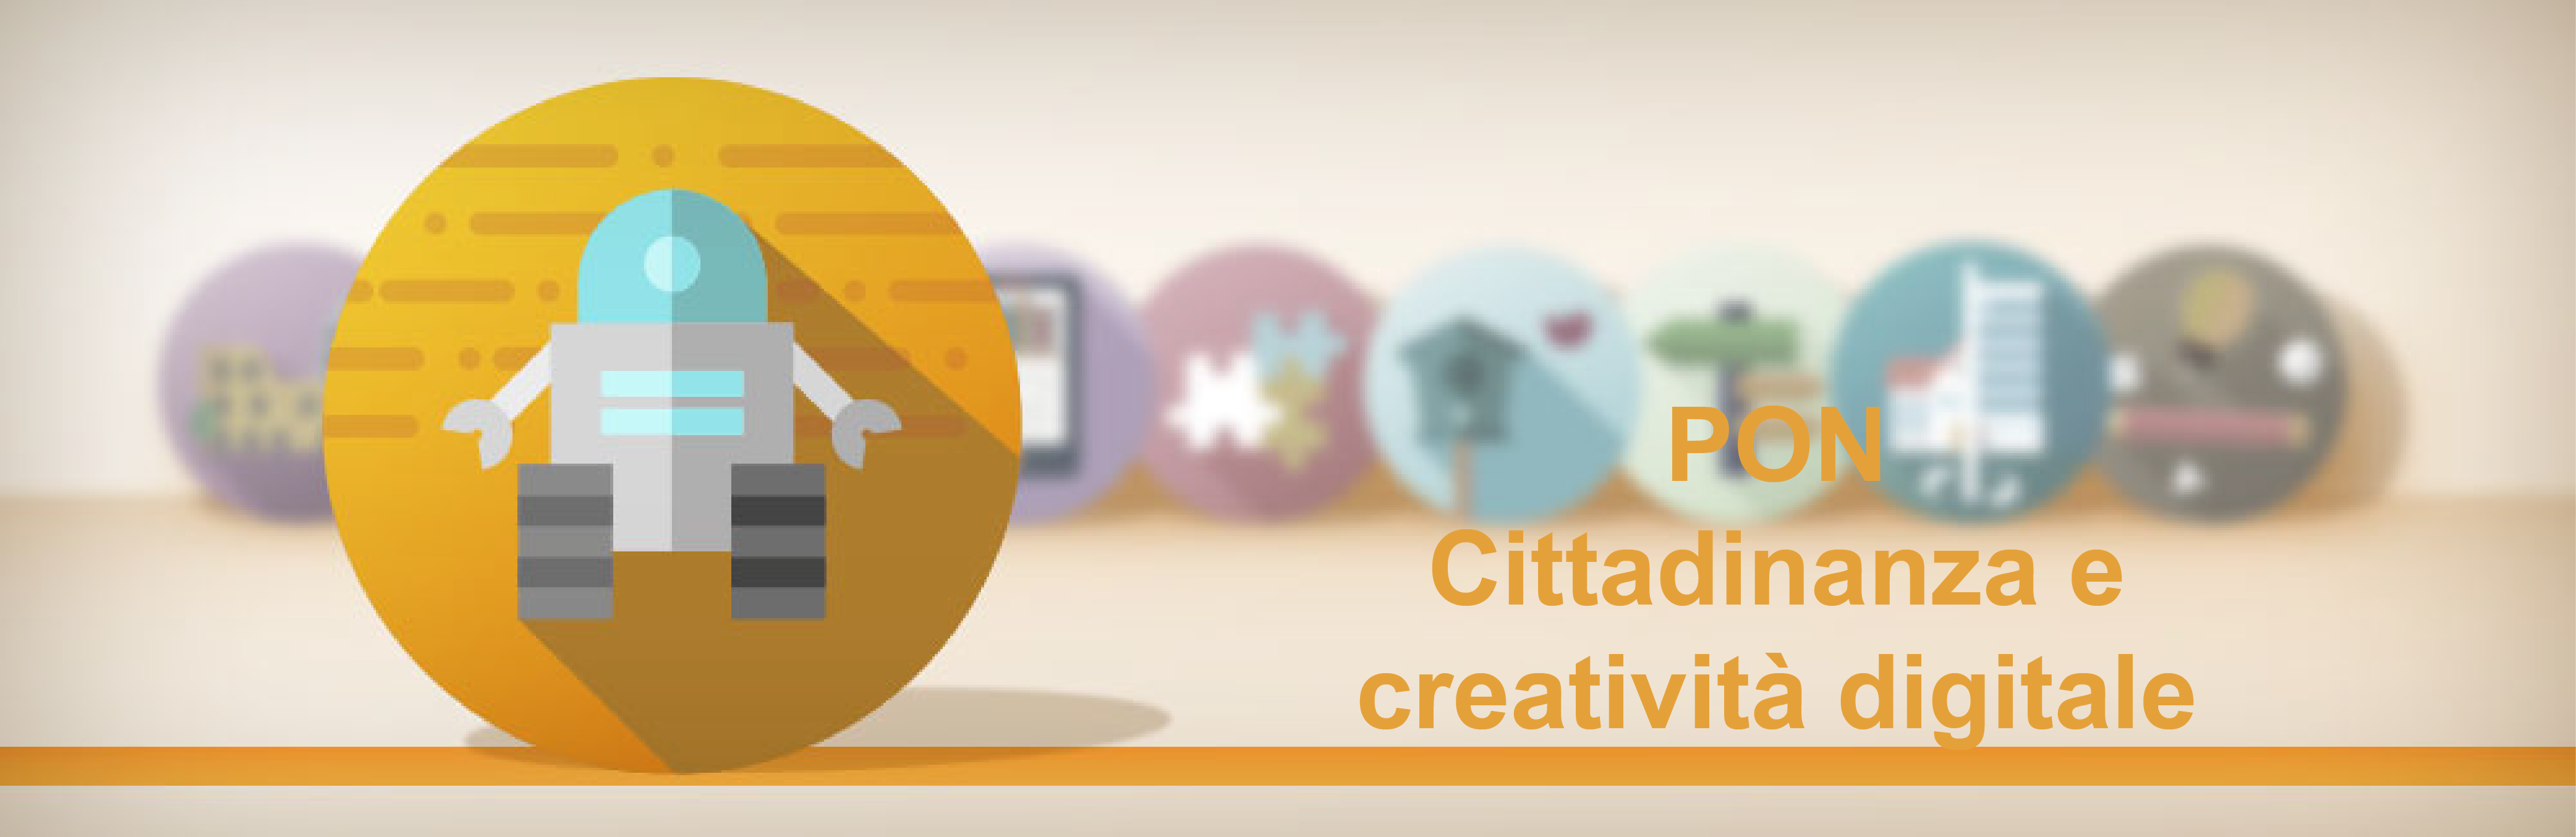 copertina-cittadinanza-creativita-01